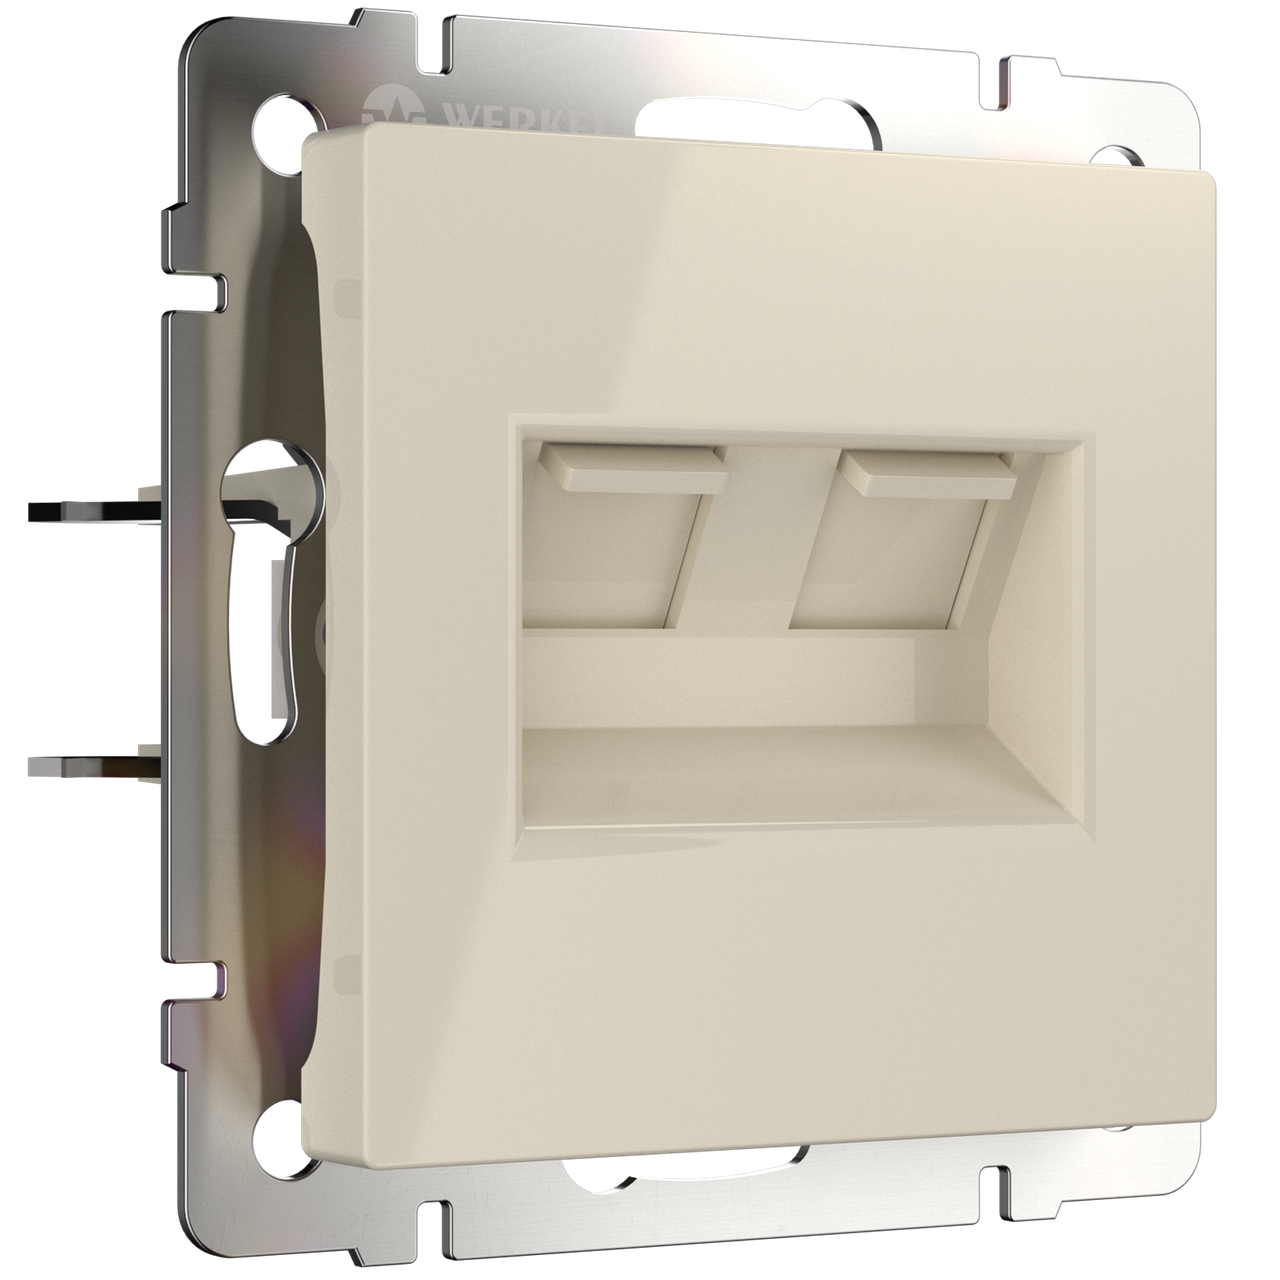 Розетка телефонная RJ-11 и Ethernet RJ-45 /WL04-RJ11-45-white (белая)